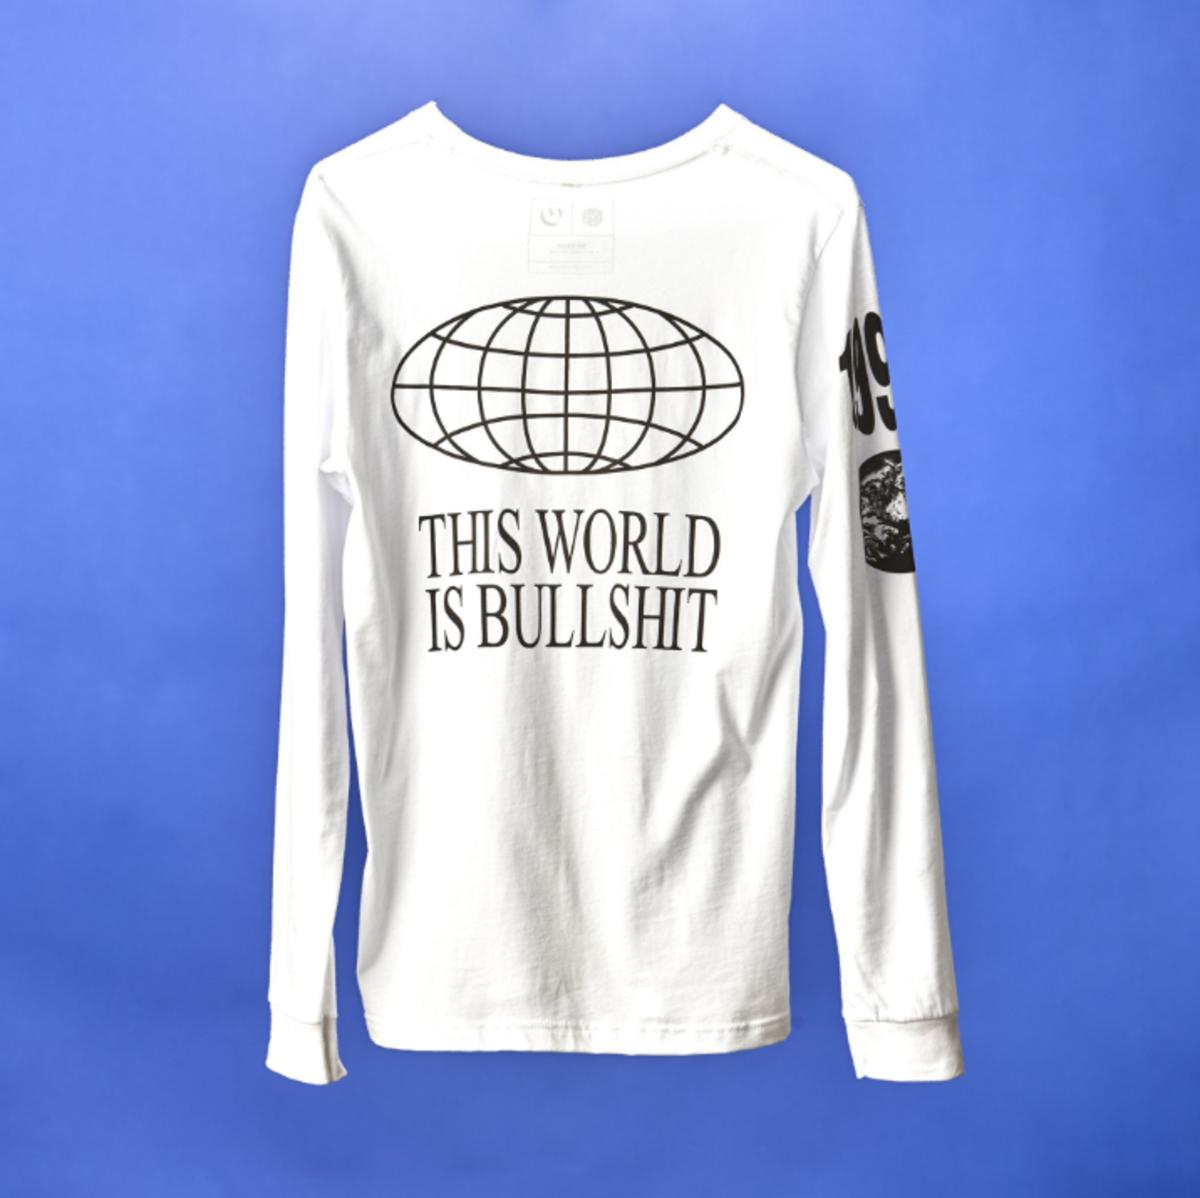 """This World Is Bullshit"" Tee, $50, available at Genius. Photo: Genius"